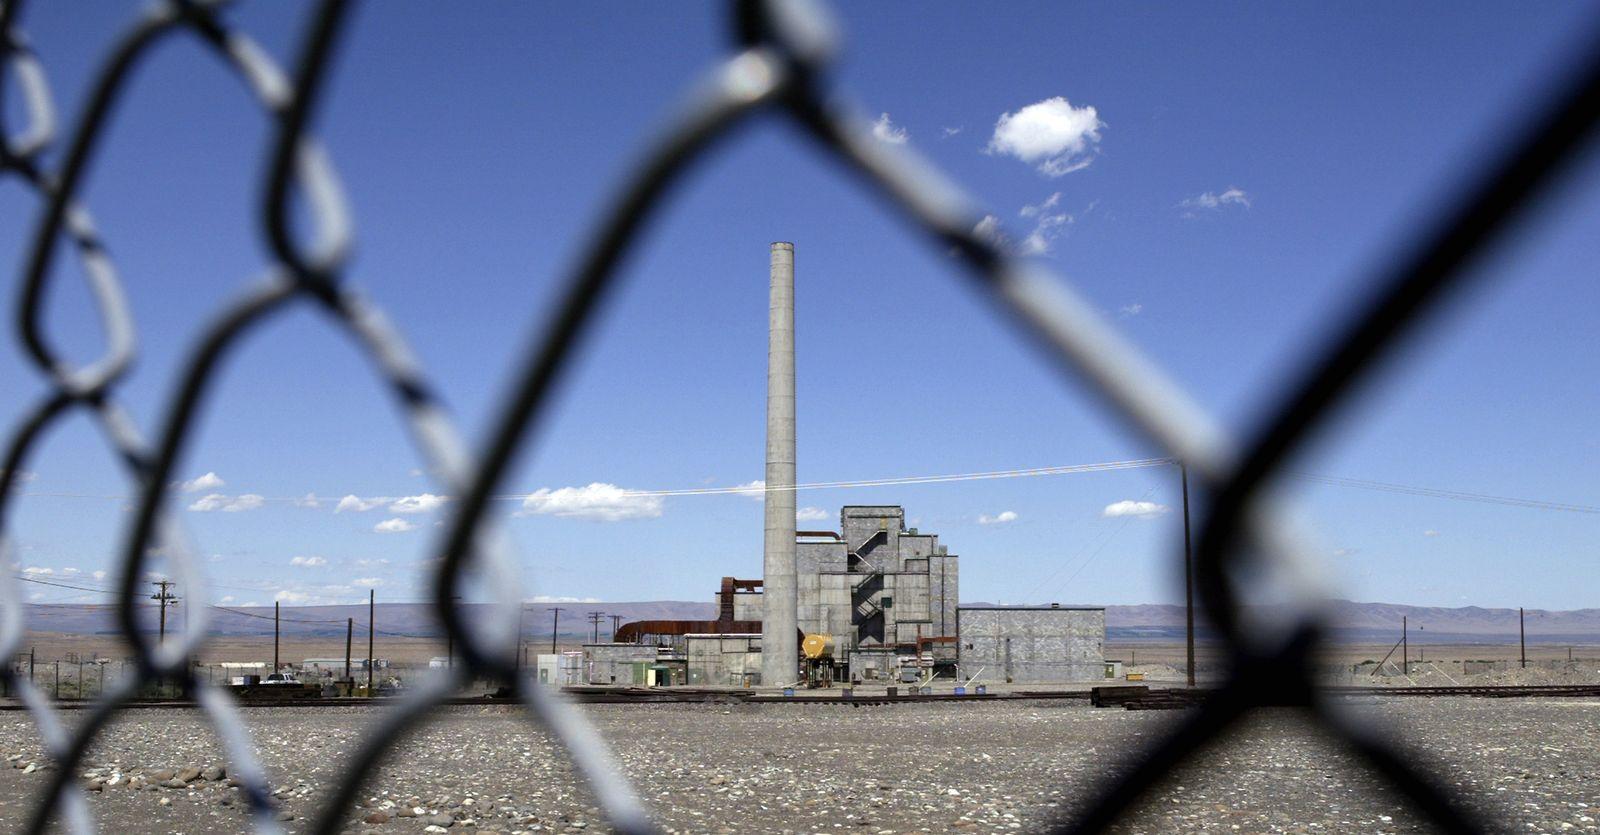 Hanford / US-Atommülldeponie